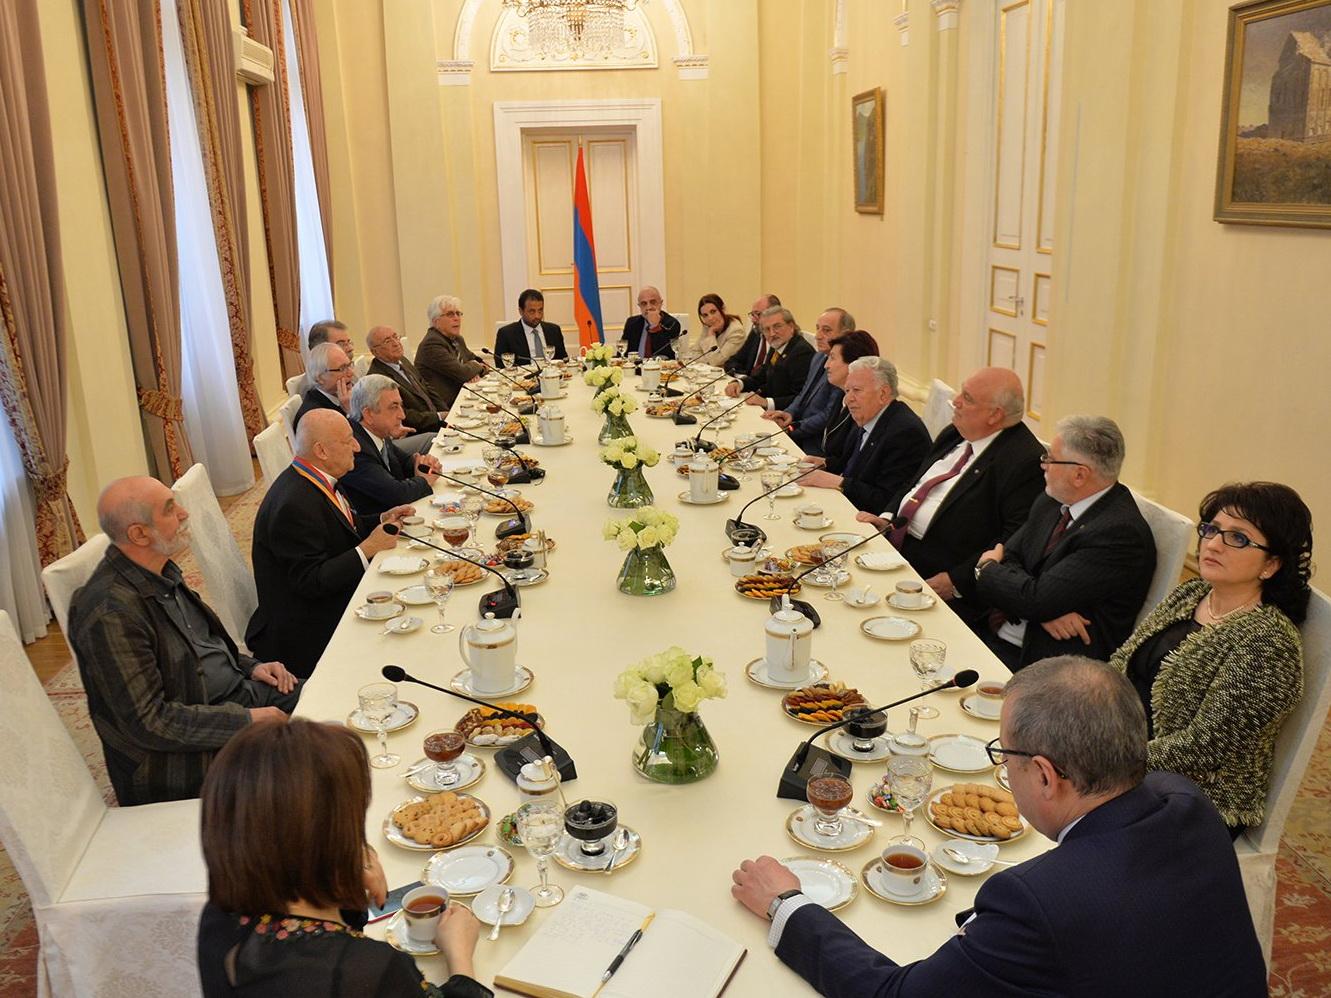 Серж Саргсян представил кандидата впрезиденты Армении